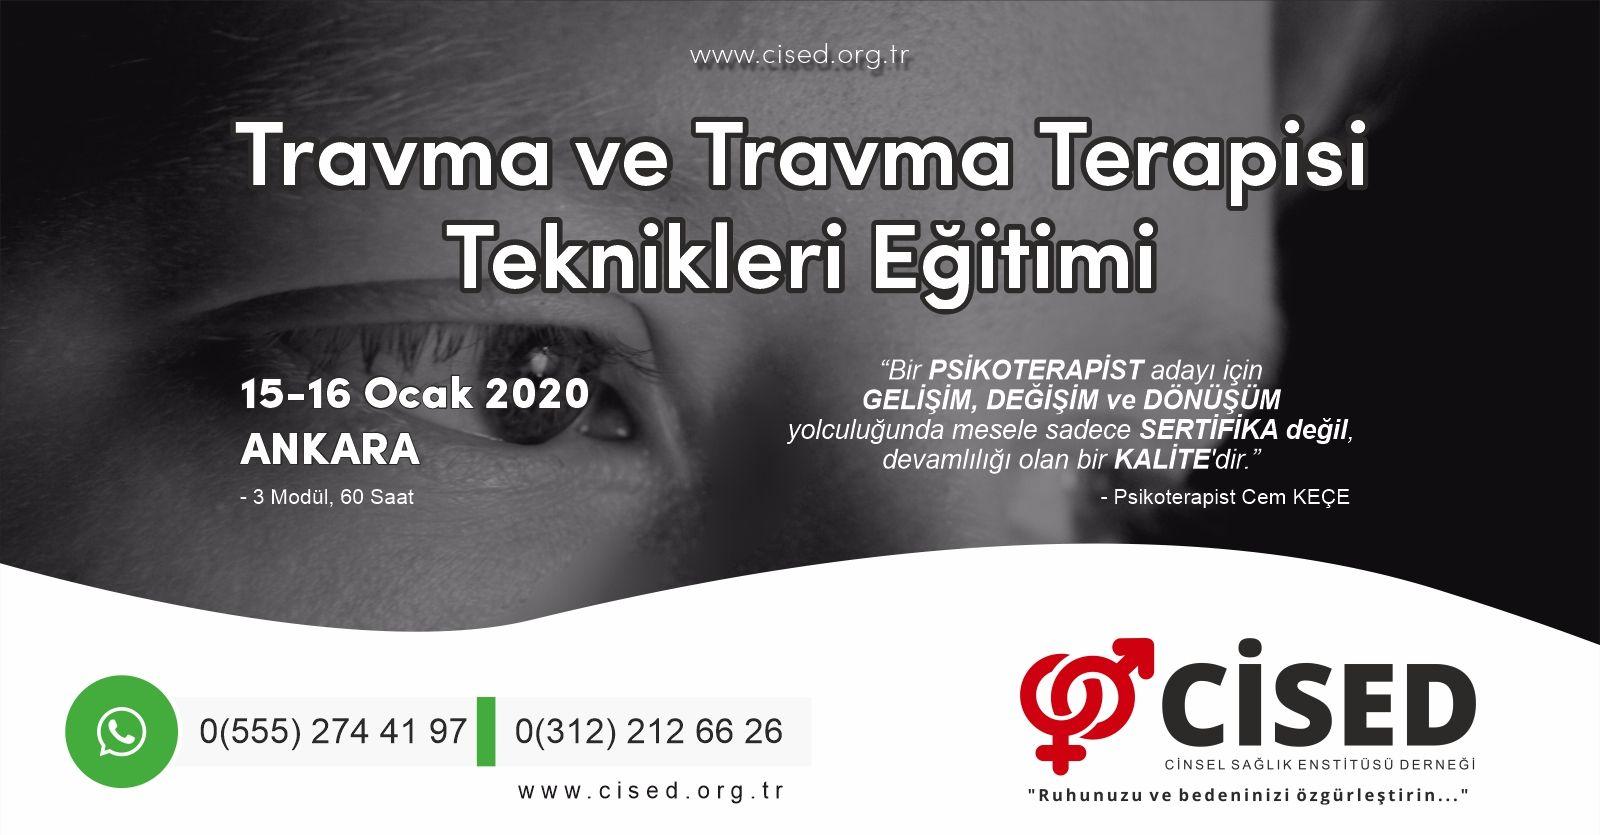 Travma ve Travma Terapisi Teknikleri Eğitimi - Ankara